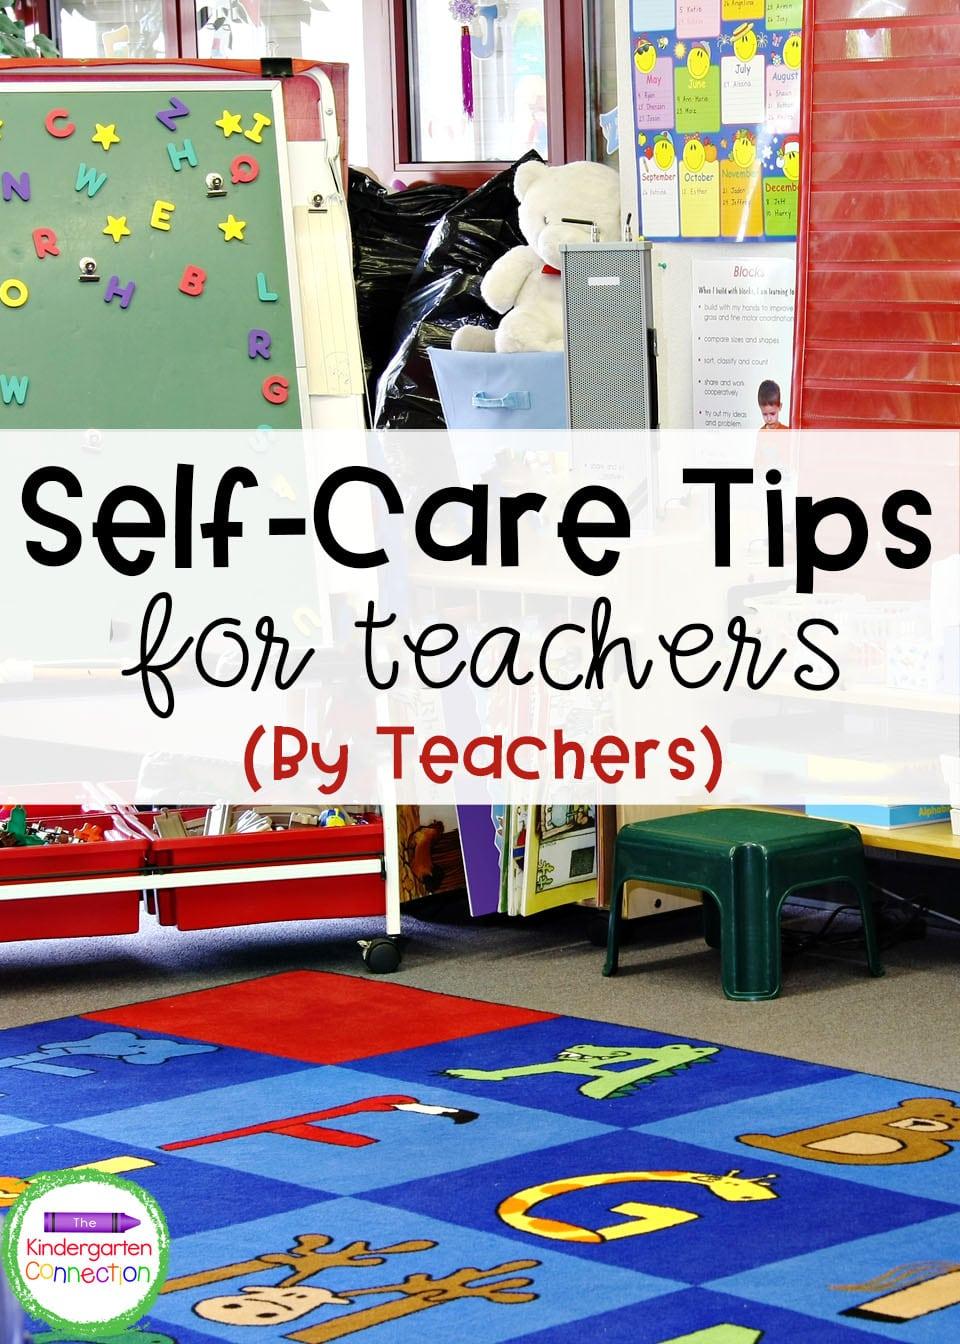 These teacher self-care tips were written for teachers, by teachers and can help you manage teacher stress.